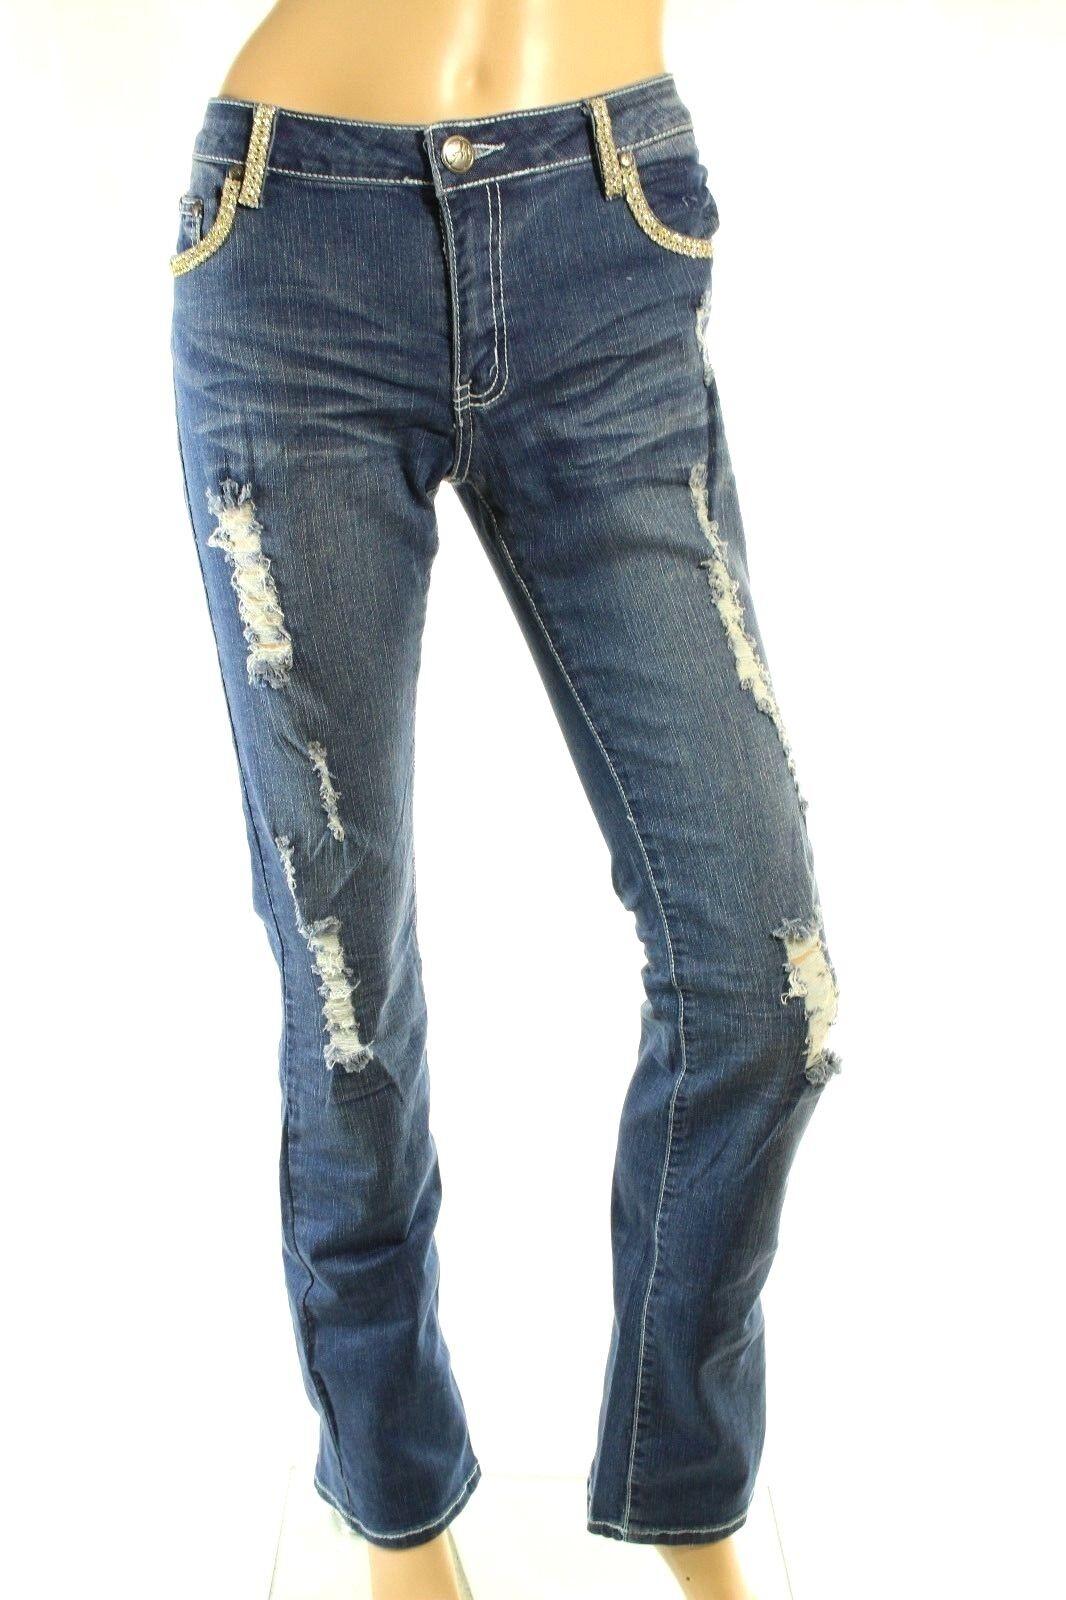 A7 Damen Denim Verziert Distressed Distressed Distressed Skinny Stretch Swarovski Kristall Jeans | Authentisch  56994c